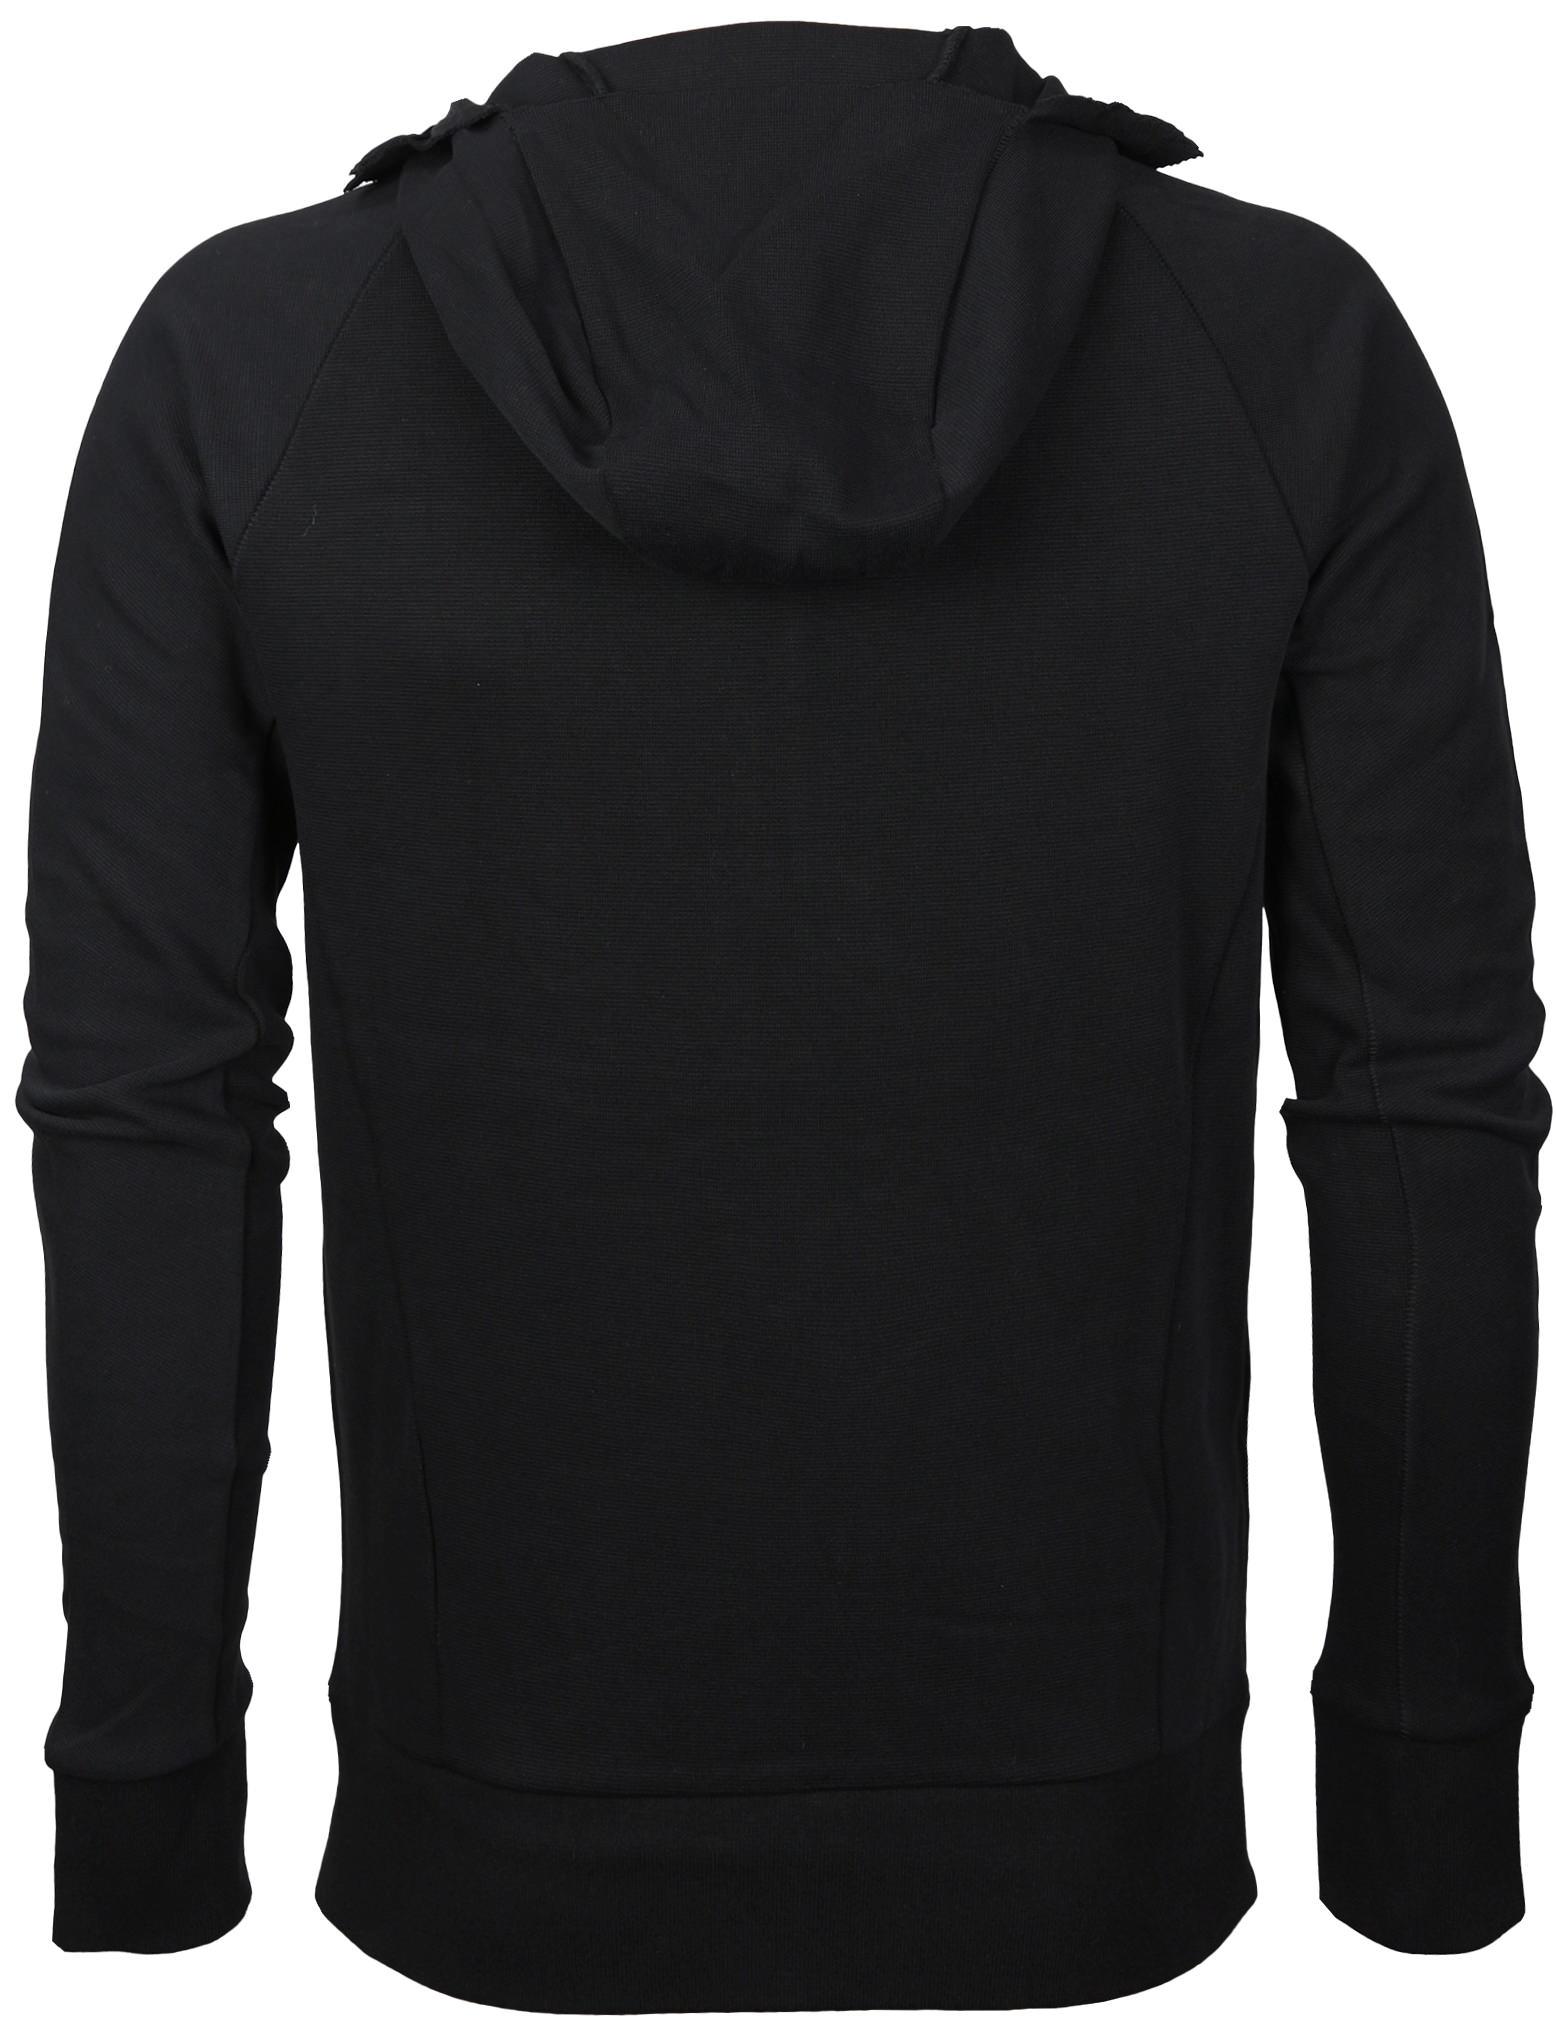 miniature 6 - Men-039-s-Zip-Up-Thumbhole-Ninja-Turtleneck-Skinny-Fit-Face-Protection-Hoodie-Jacket